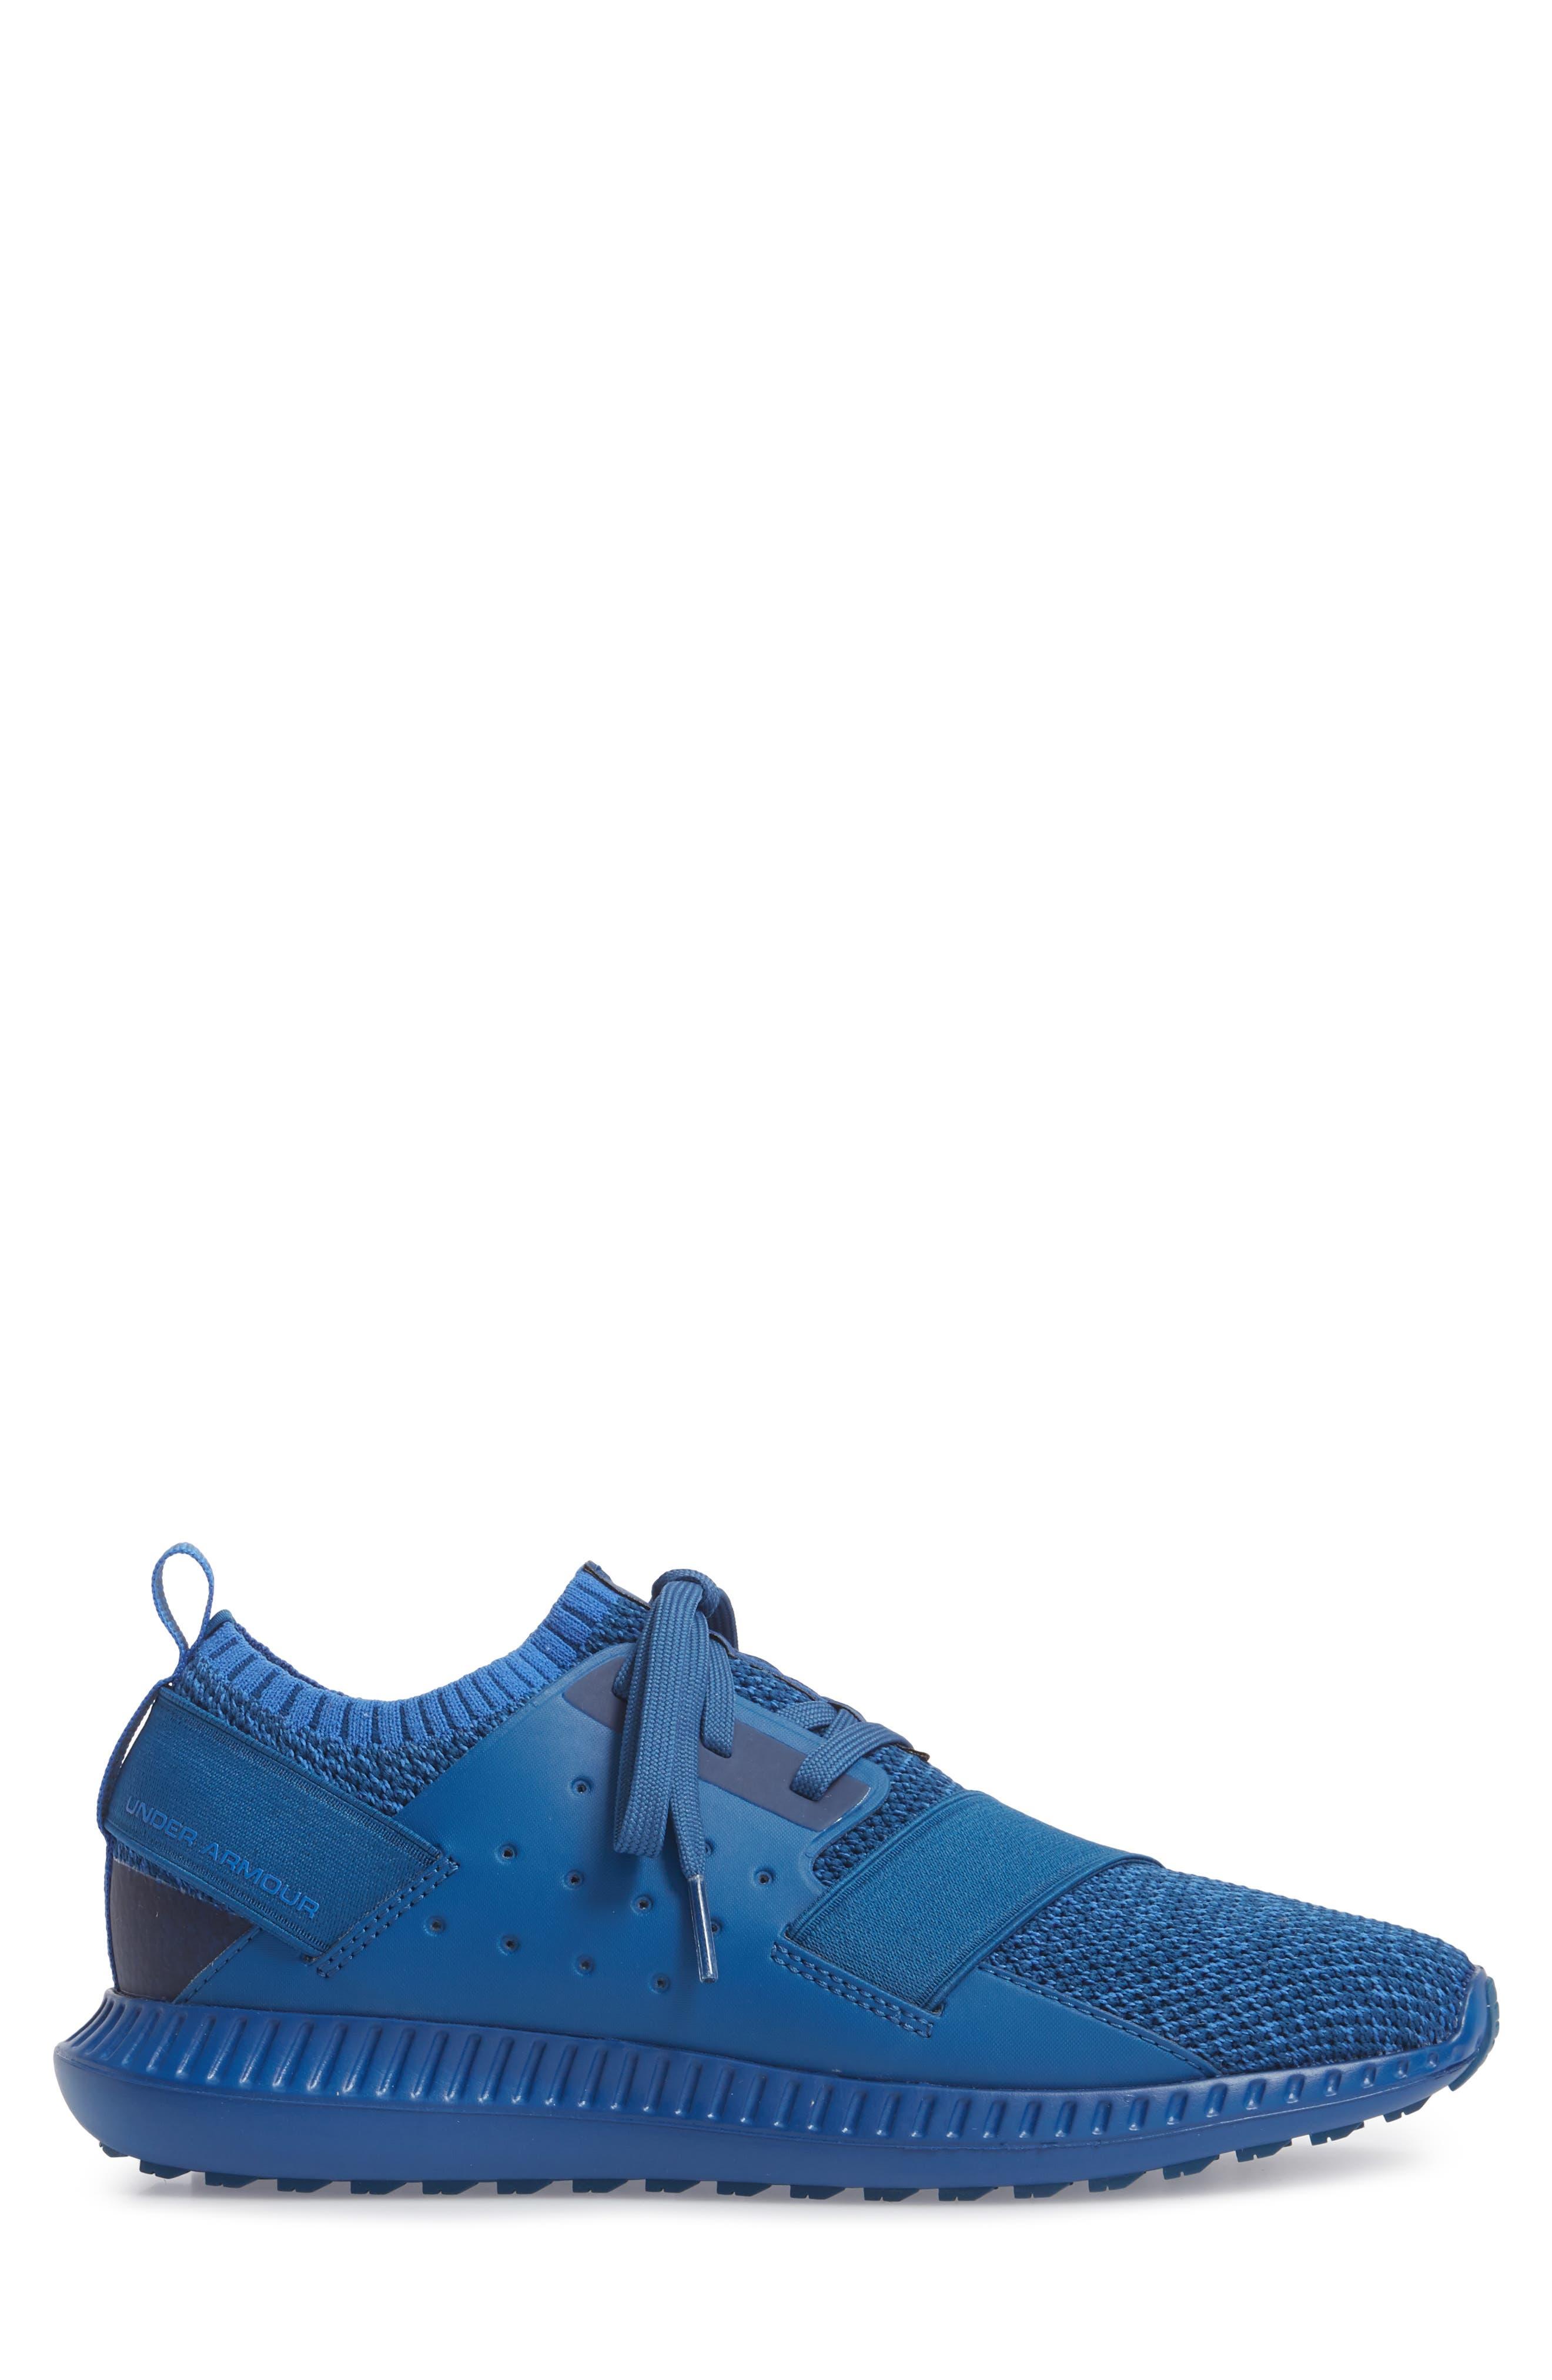 Threadborne Shift Sneaker,                             Alternate thumbnail 3, color,                             Blue / Mediterranean